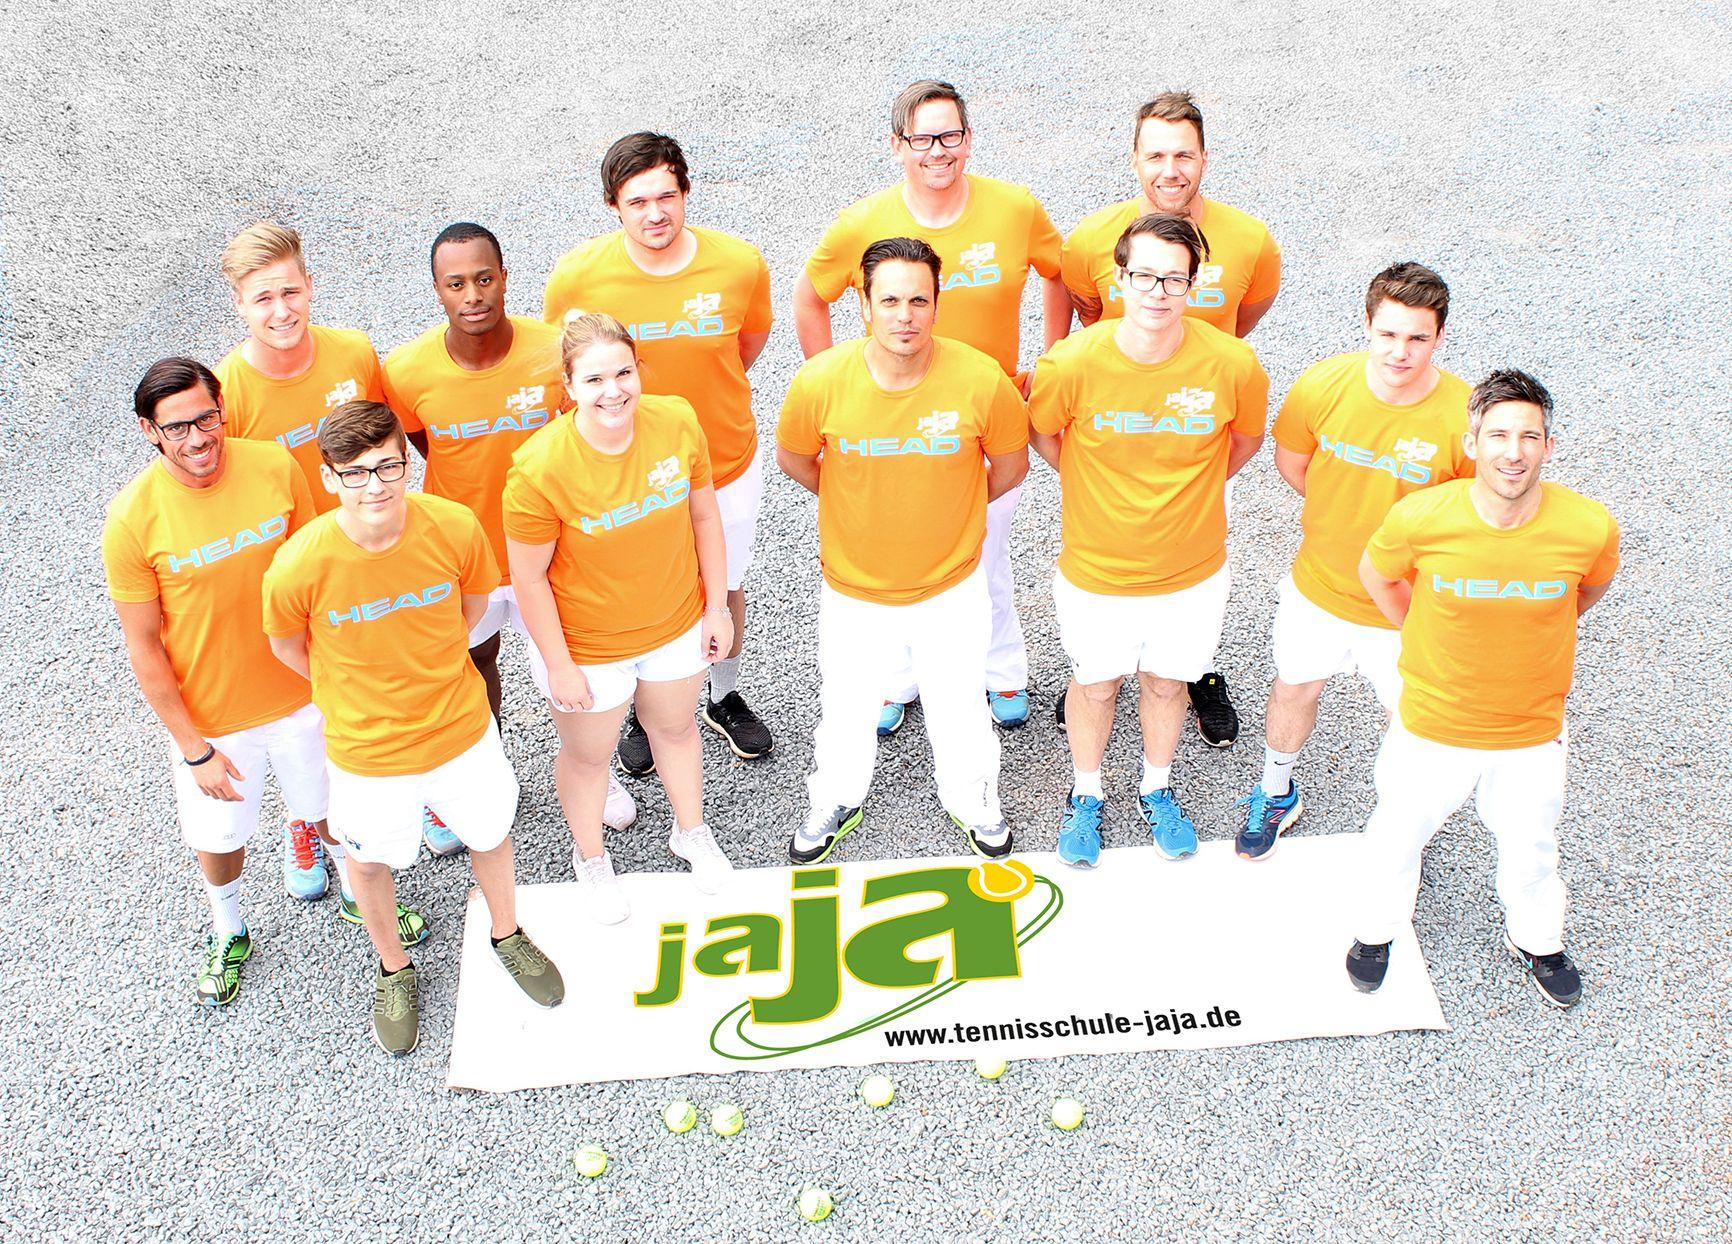 Das jaja-Team